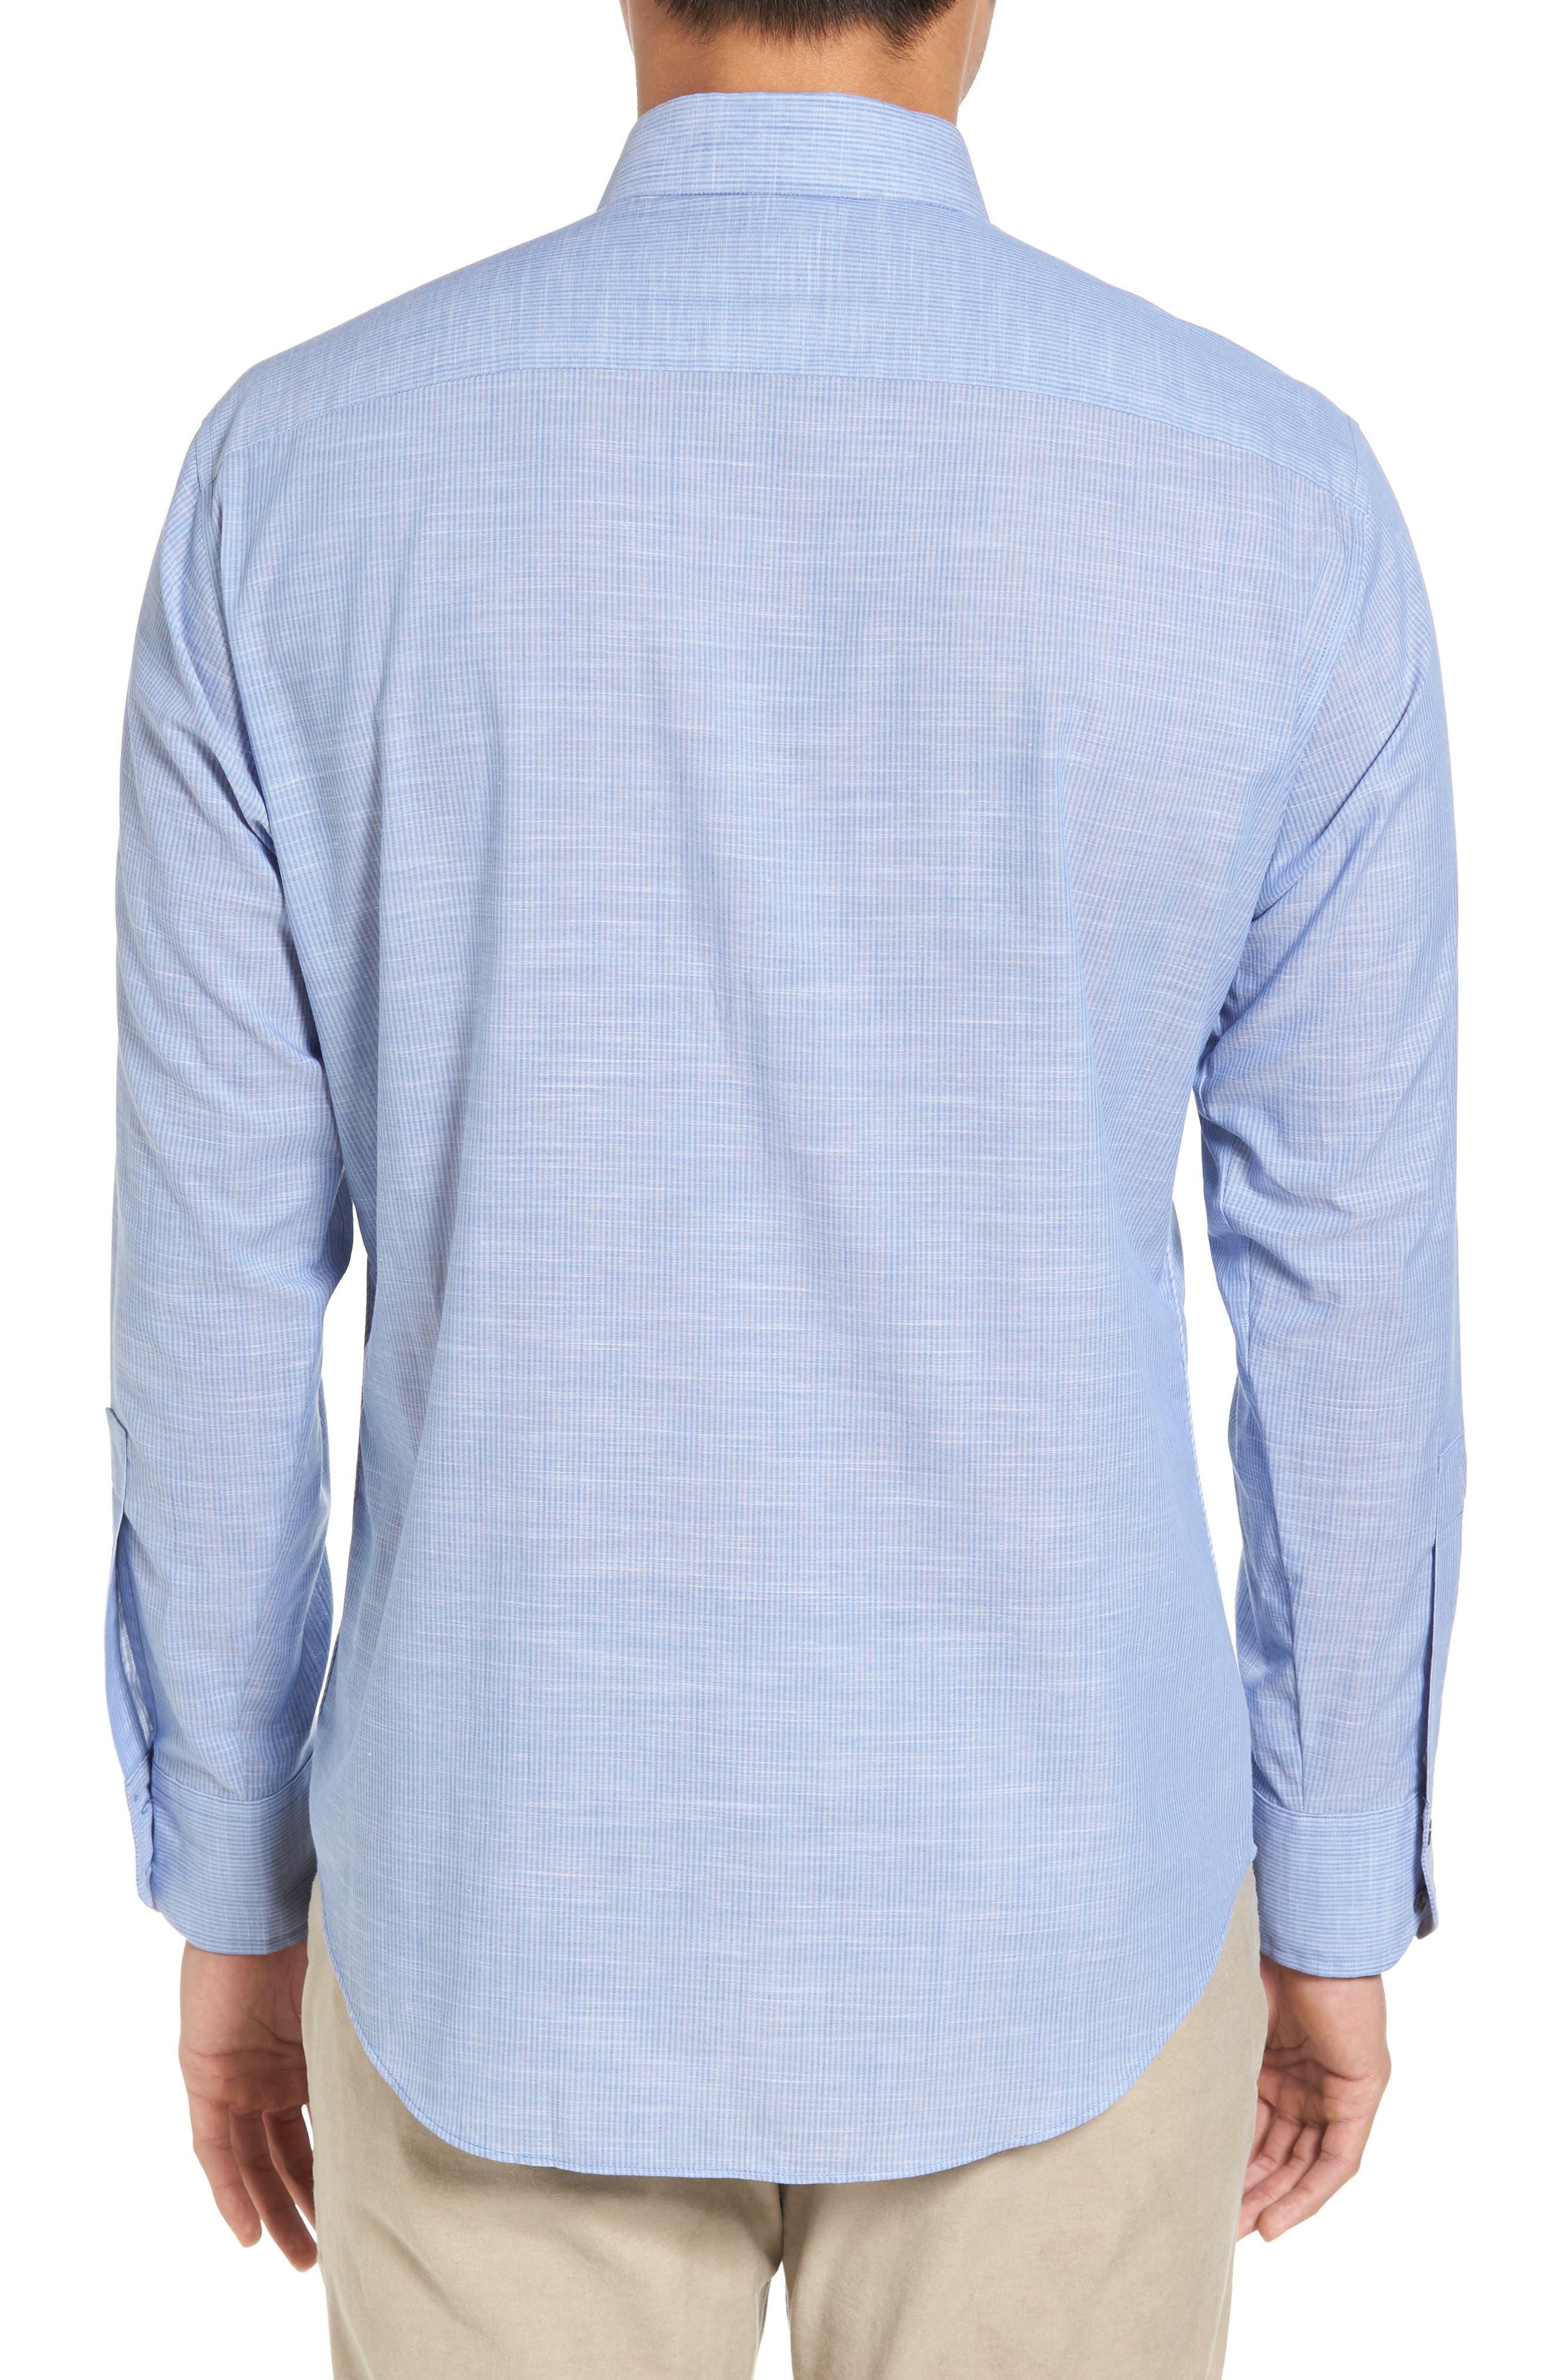 Alternate Image 2  - Zachary Prell Ronan Trim Fit Stripe Sport Shirt